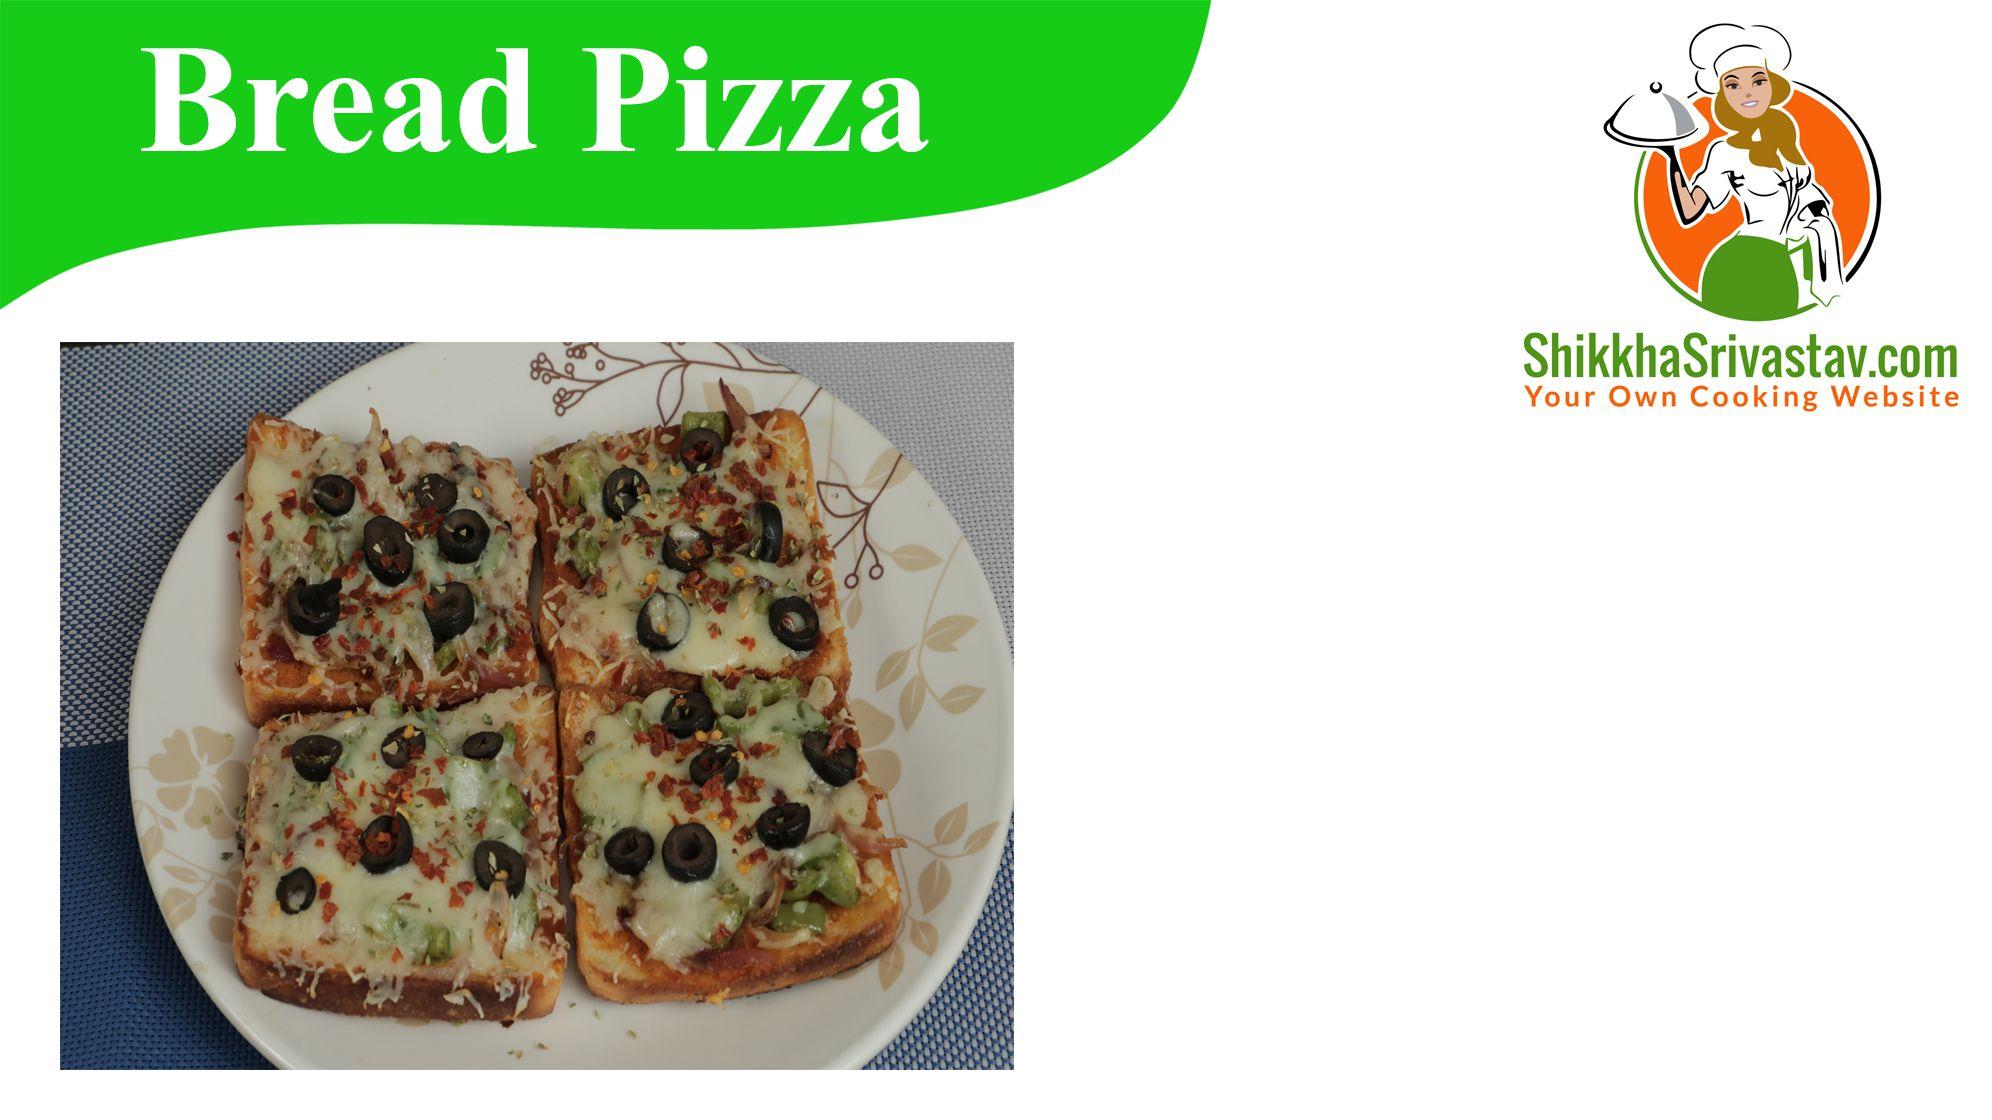 Bread pizza recipe in hindi on tawa how to make bread pizza on tawa bread pizza recipe in hindi on tawa how to make bread pizza on tawa at forumfinder Choice Image